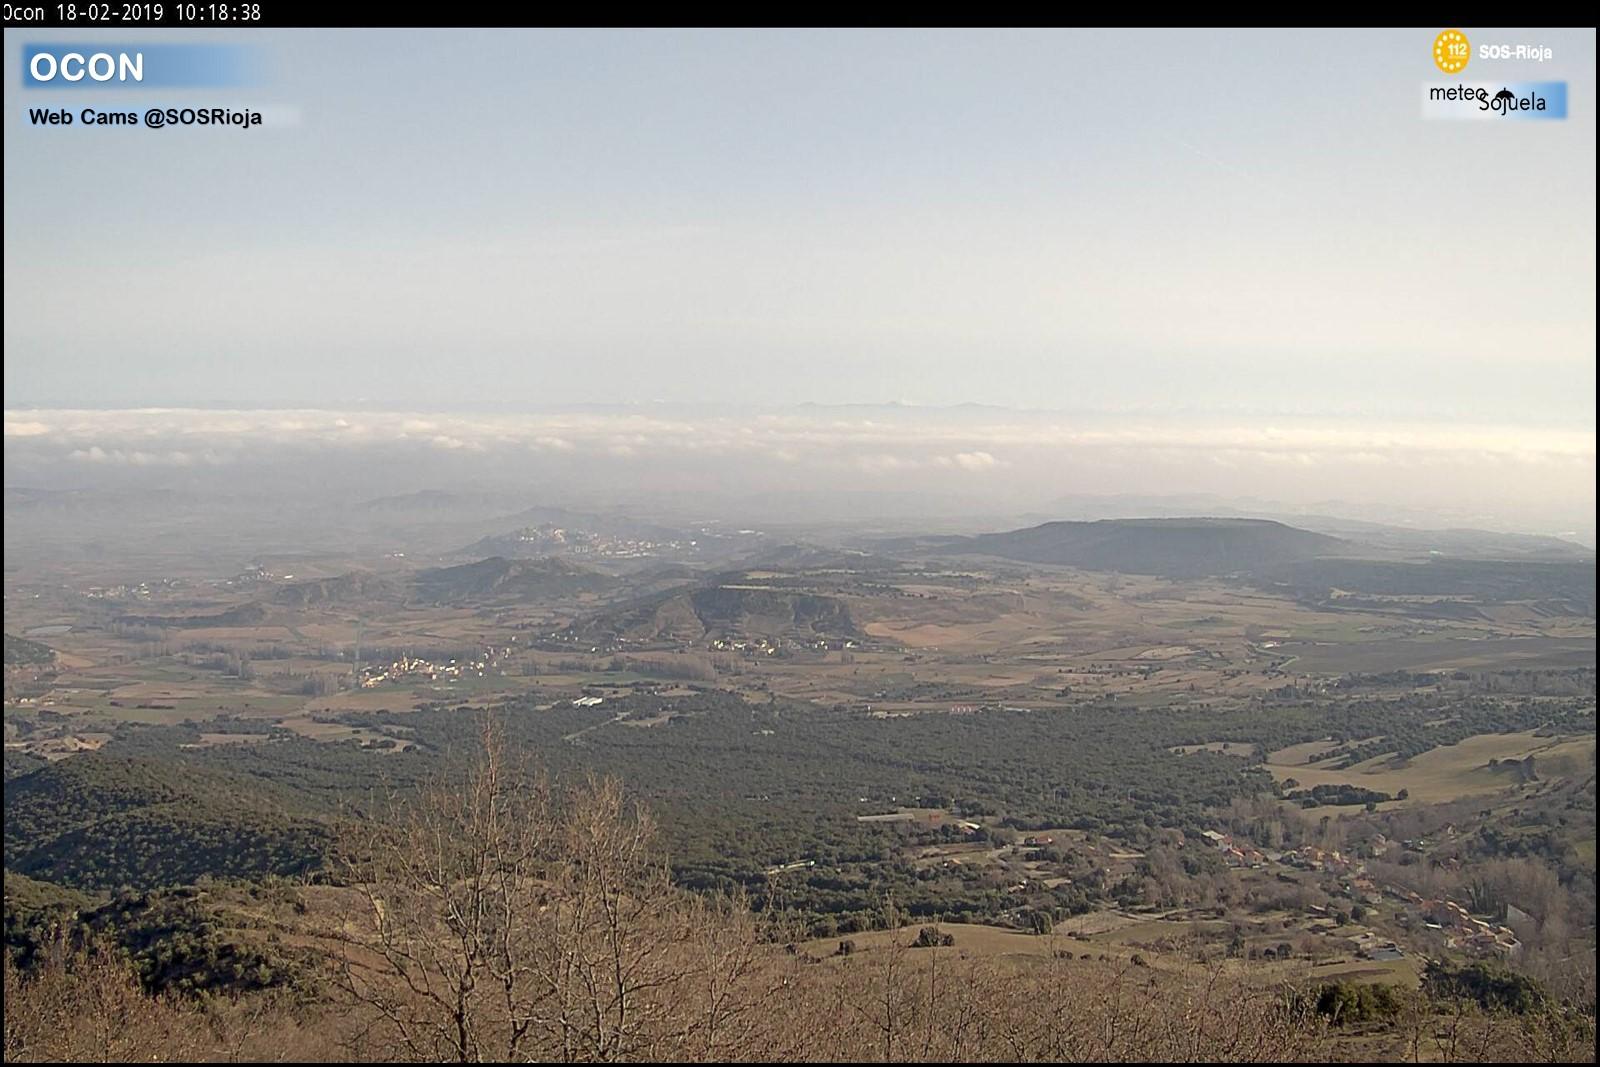 Mar de nubes desde Ocón. SOS Rioja. Meteosojuela